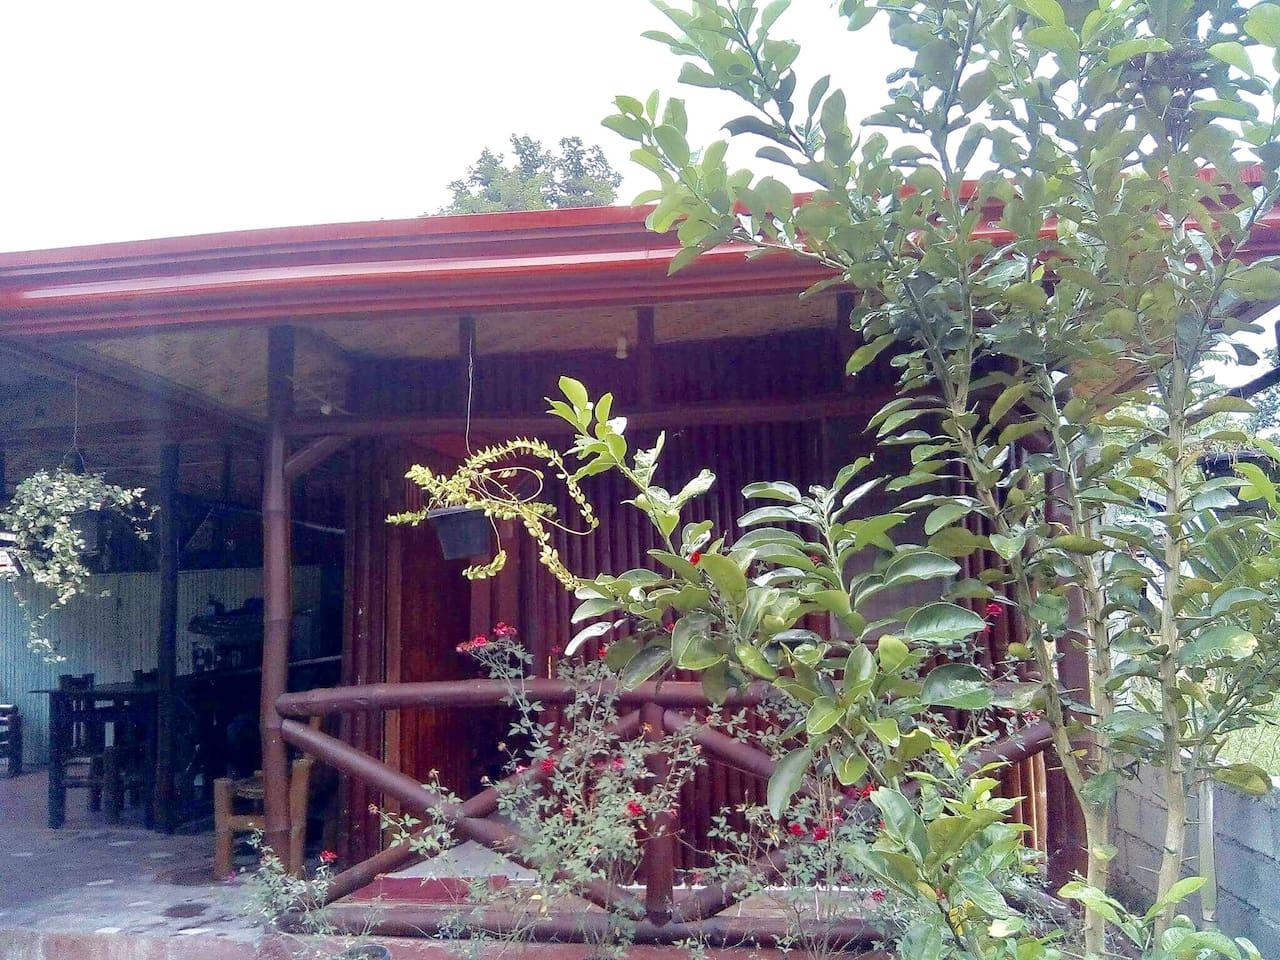 BAMBOO HOUSE #3